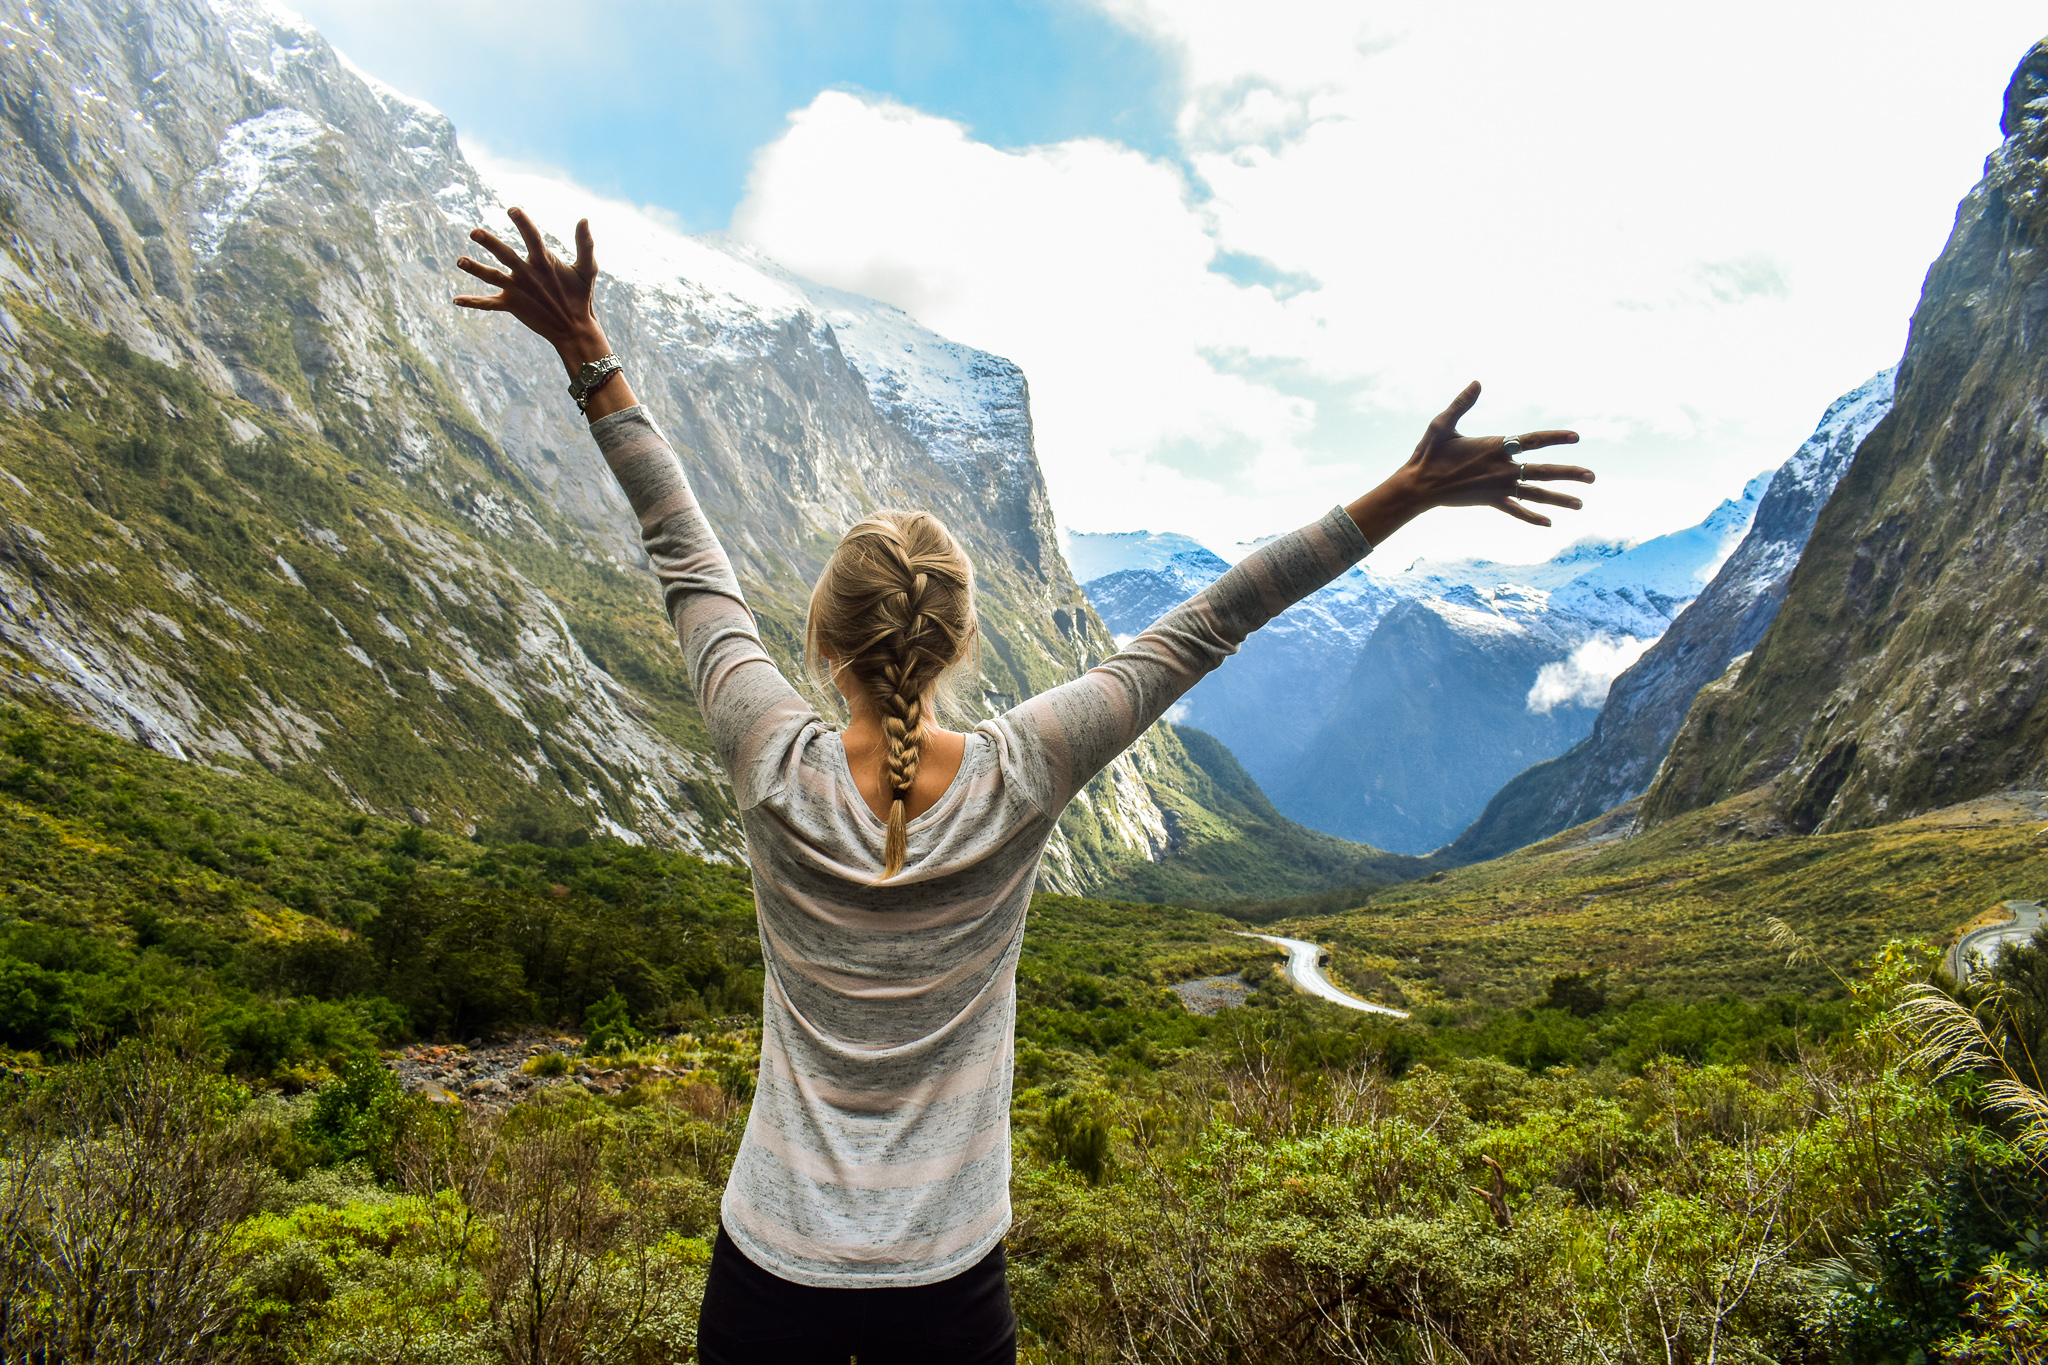 Summer Program - Adventure/Trips | Travel For Teens: Australia and New Zealand for Older Teens